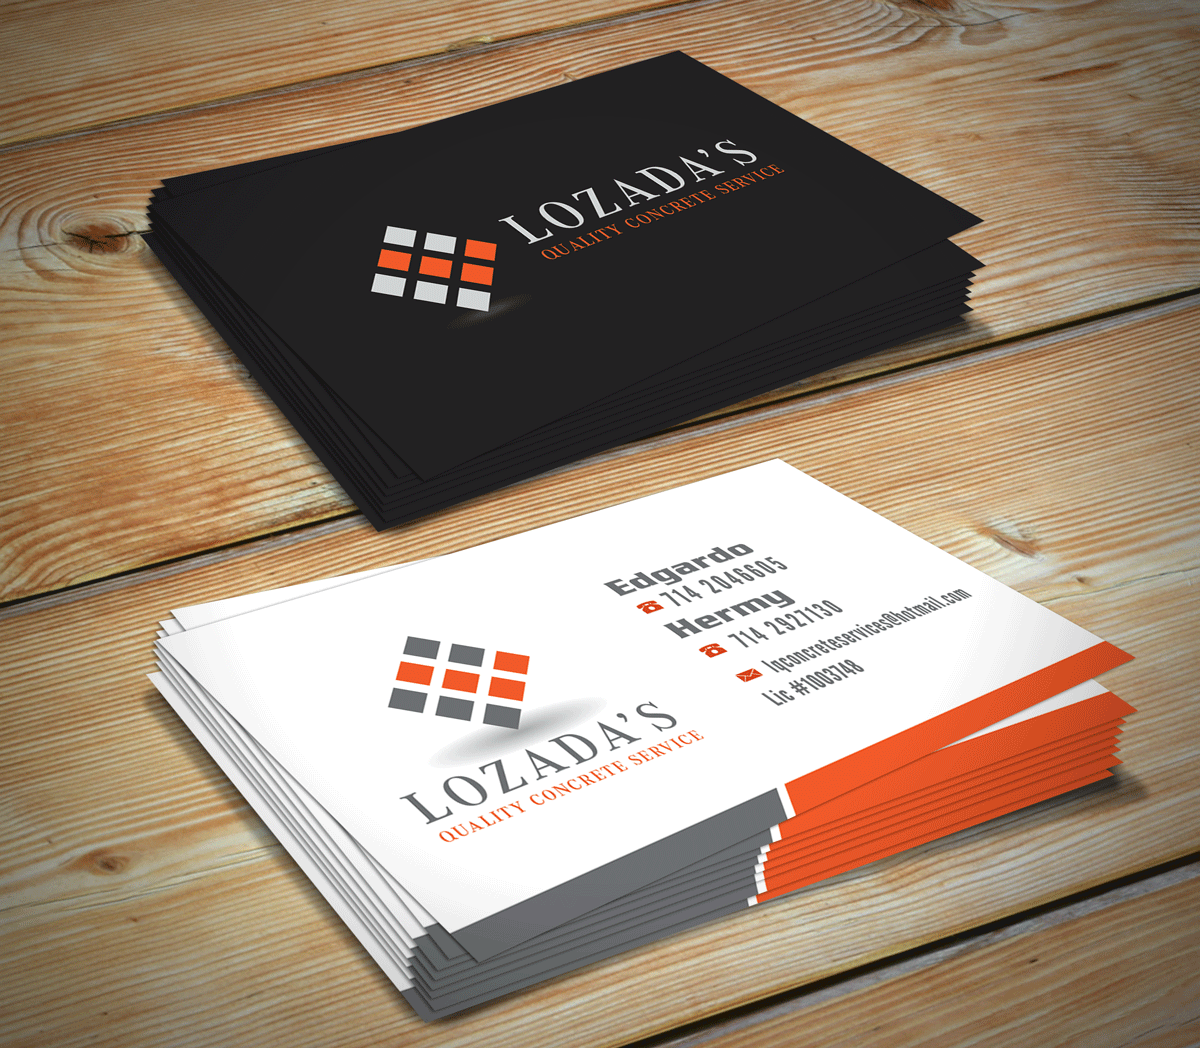 Concrete Company Business Cards   Arts - Arts